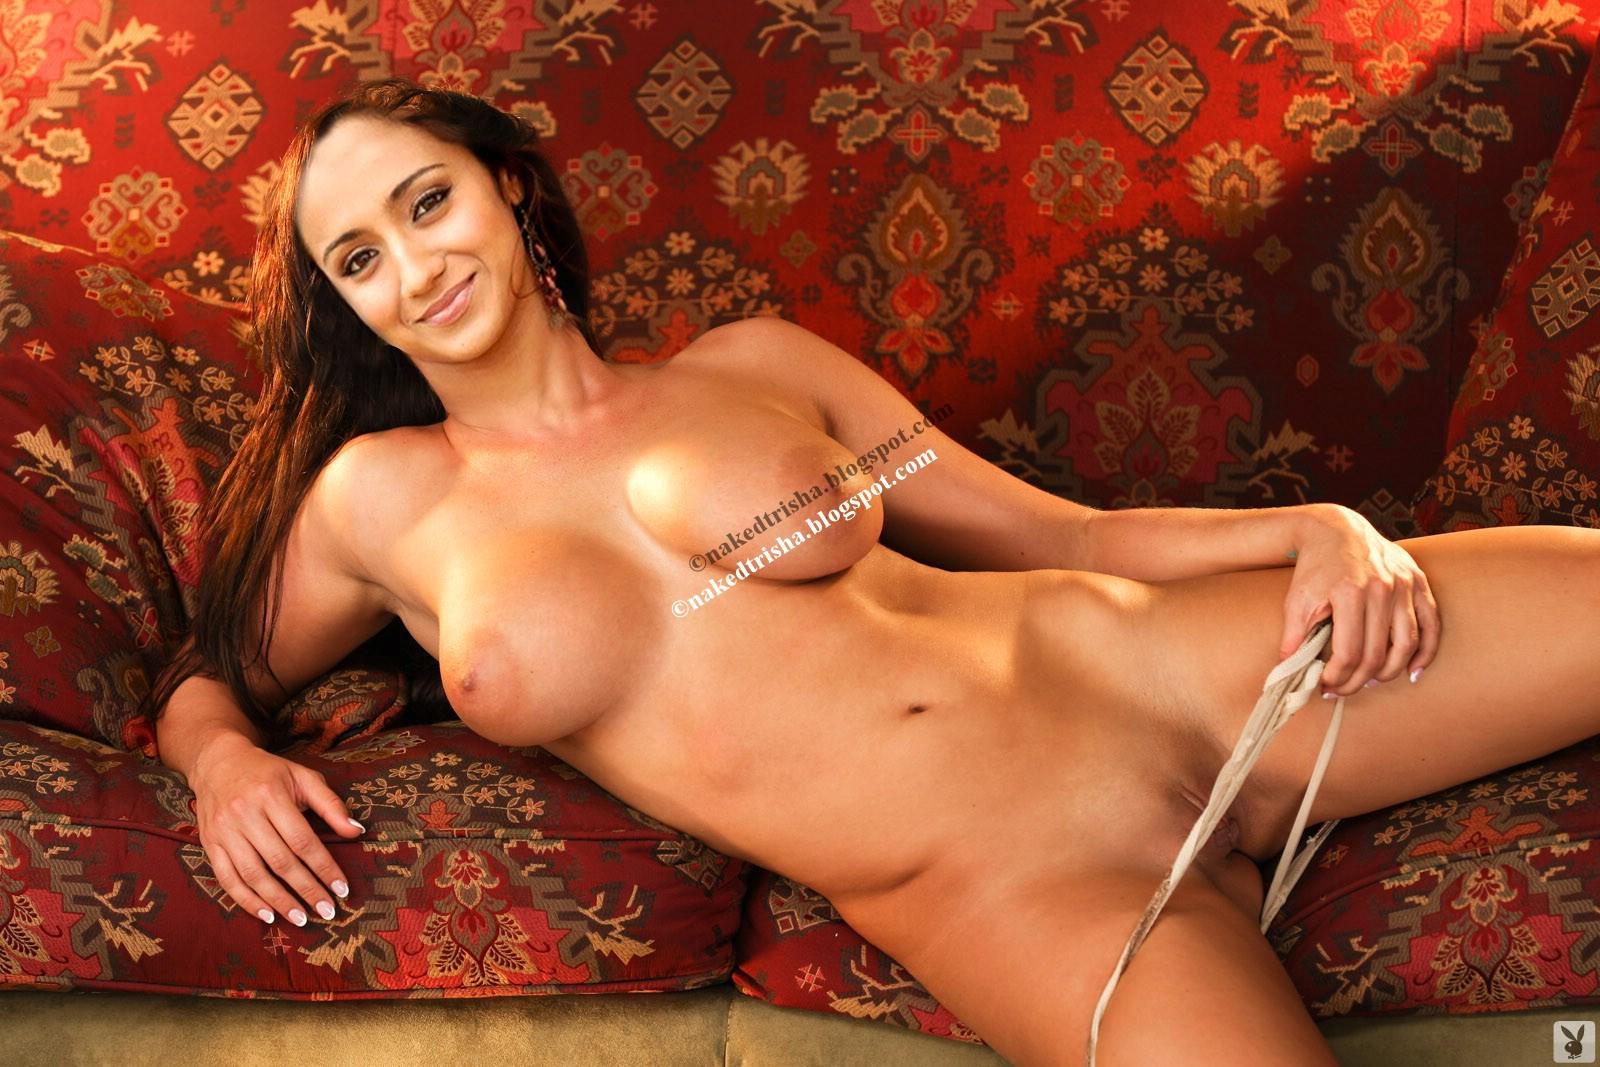 Playboy Nancy Patton Nude